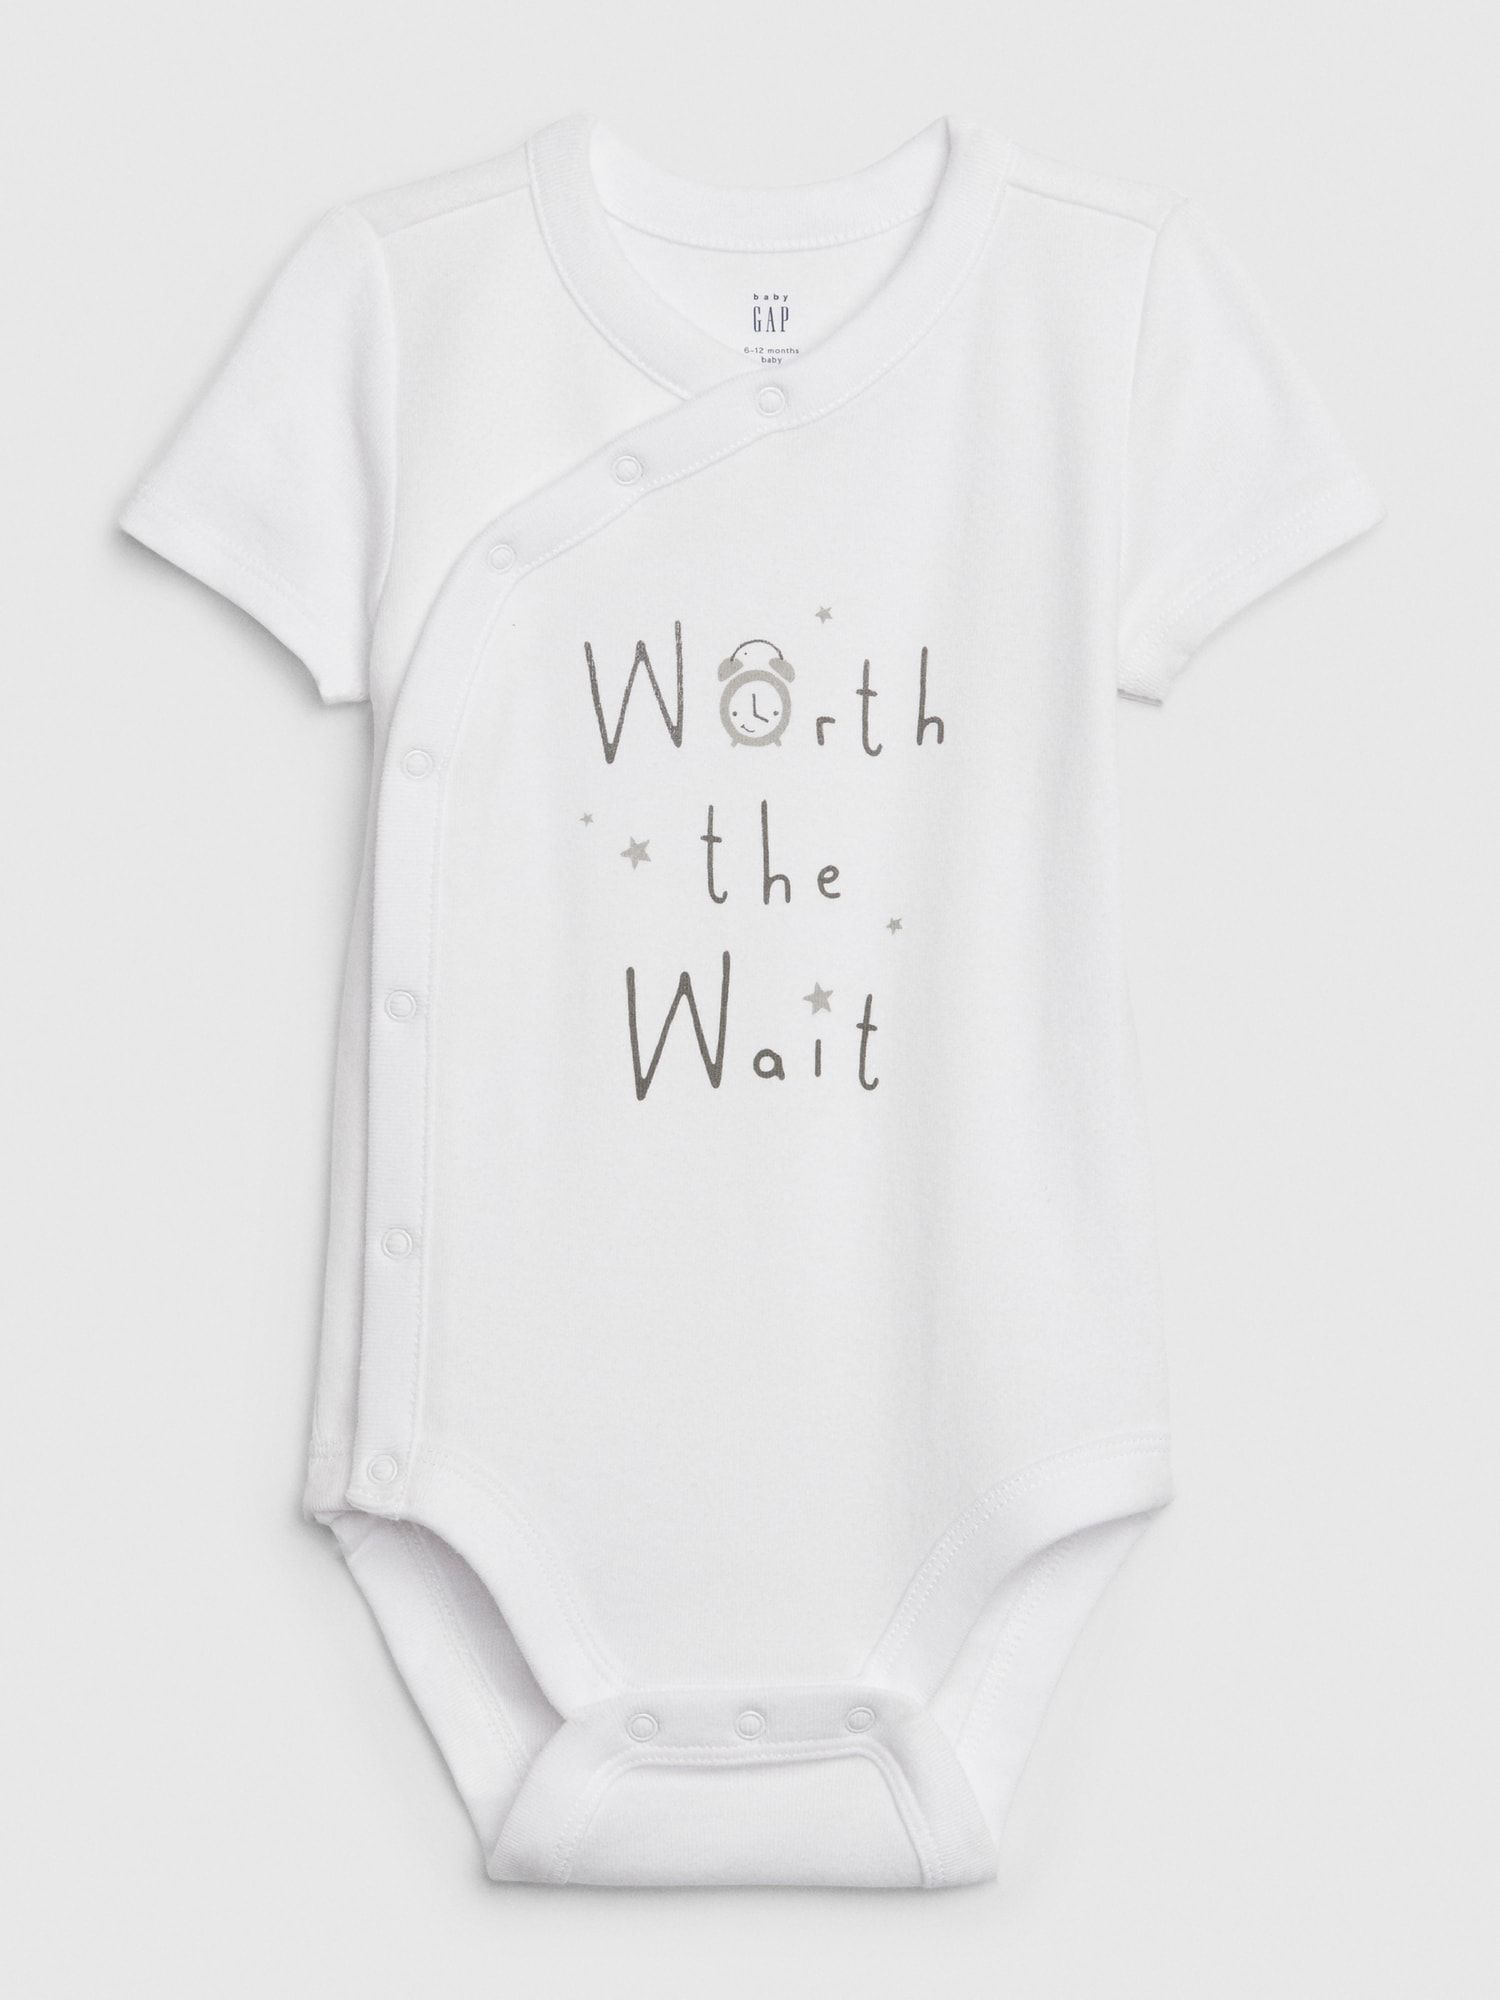 Gap Baby Baby Kimono Graphic Bodysuit White In 2020 Baby Kids Clothes Baby Outfits Newborn Baby Kimono